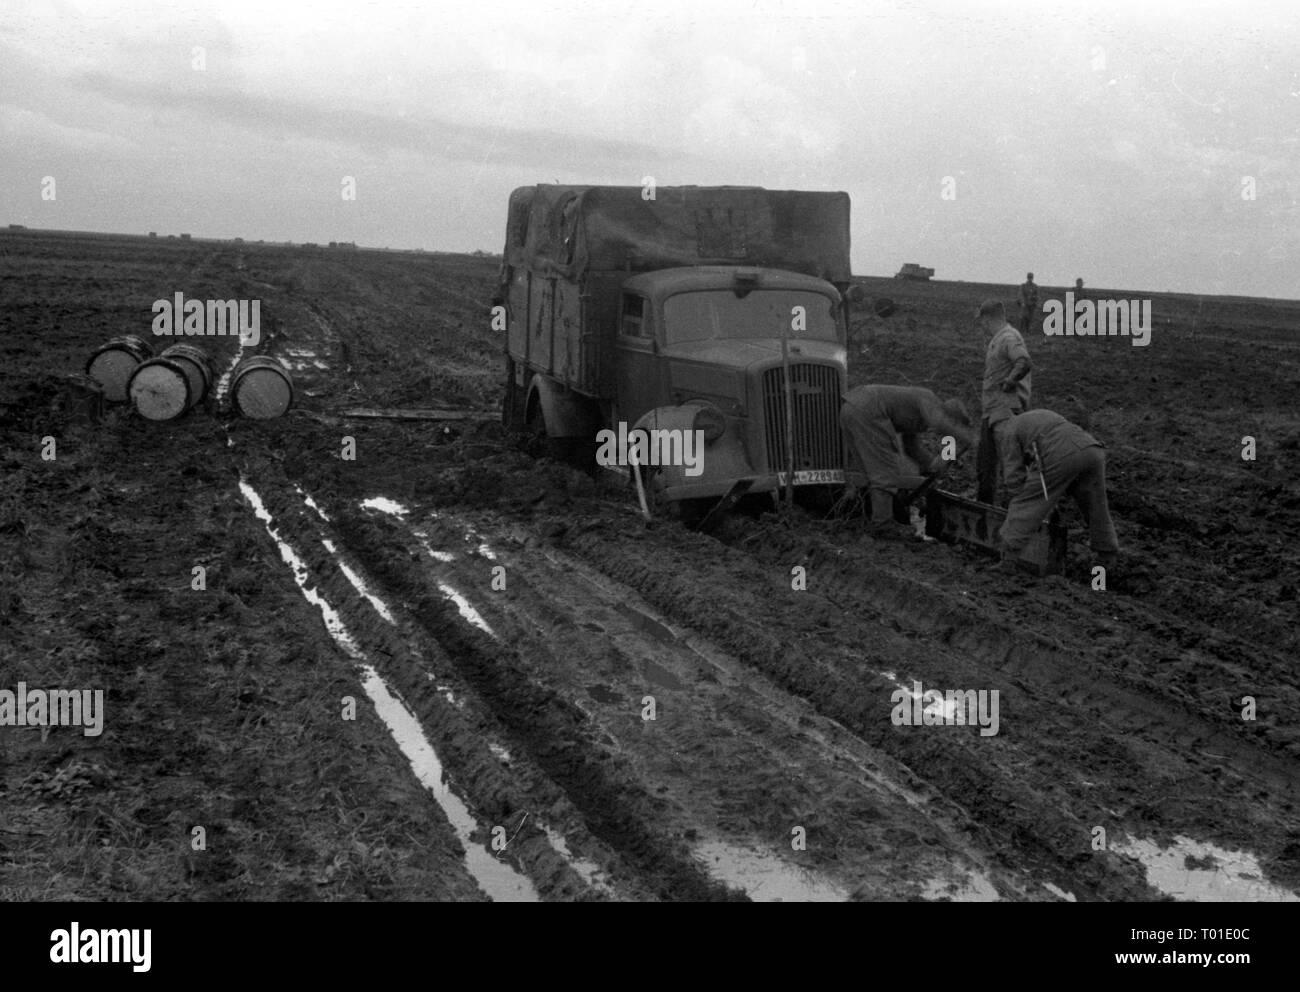 Wehrmacht Heer Ostfront Opel Blitz - Esercito Tedesco al Fronte Orientale Immagini Stock